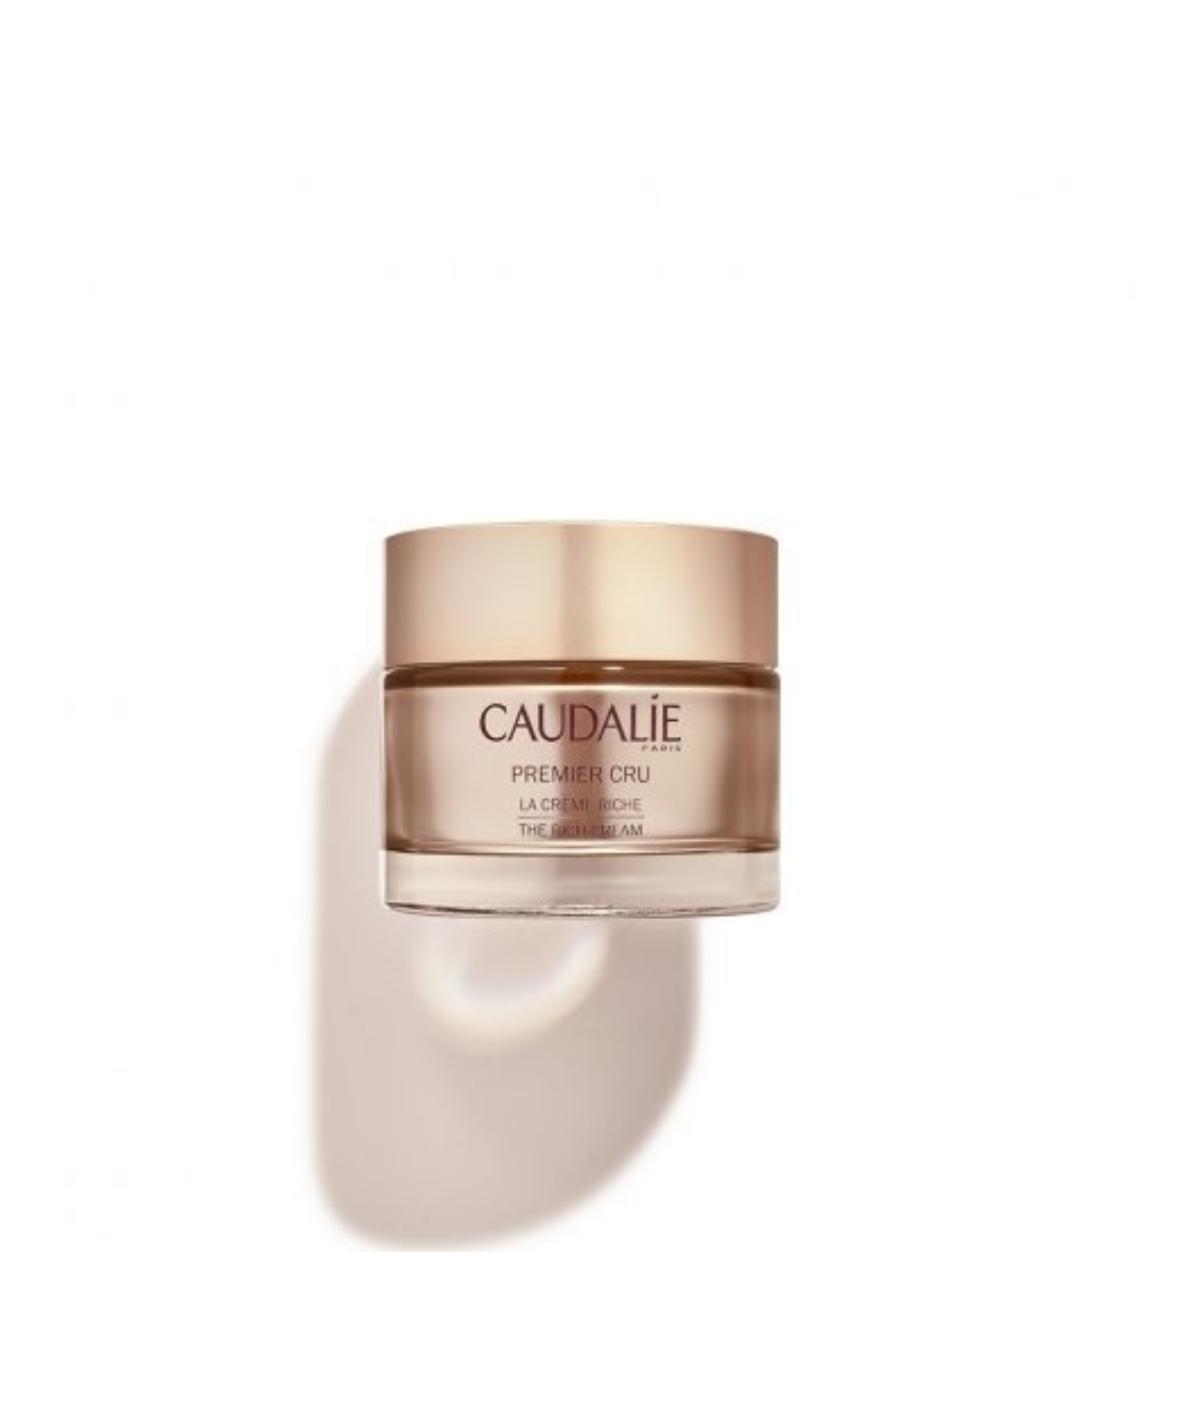 Caudalie Premier Cru la Crema Riche – 50 ml